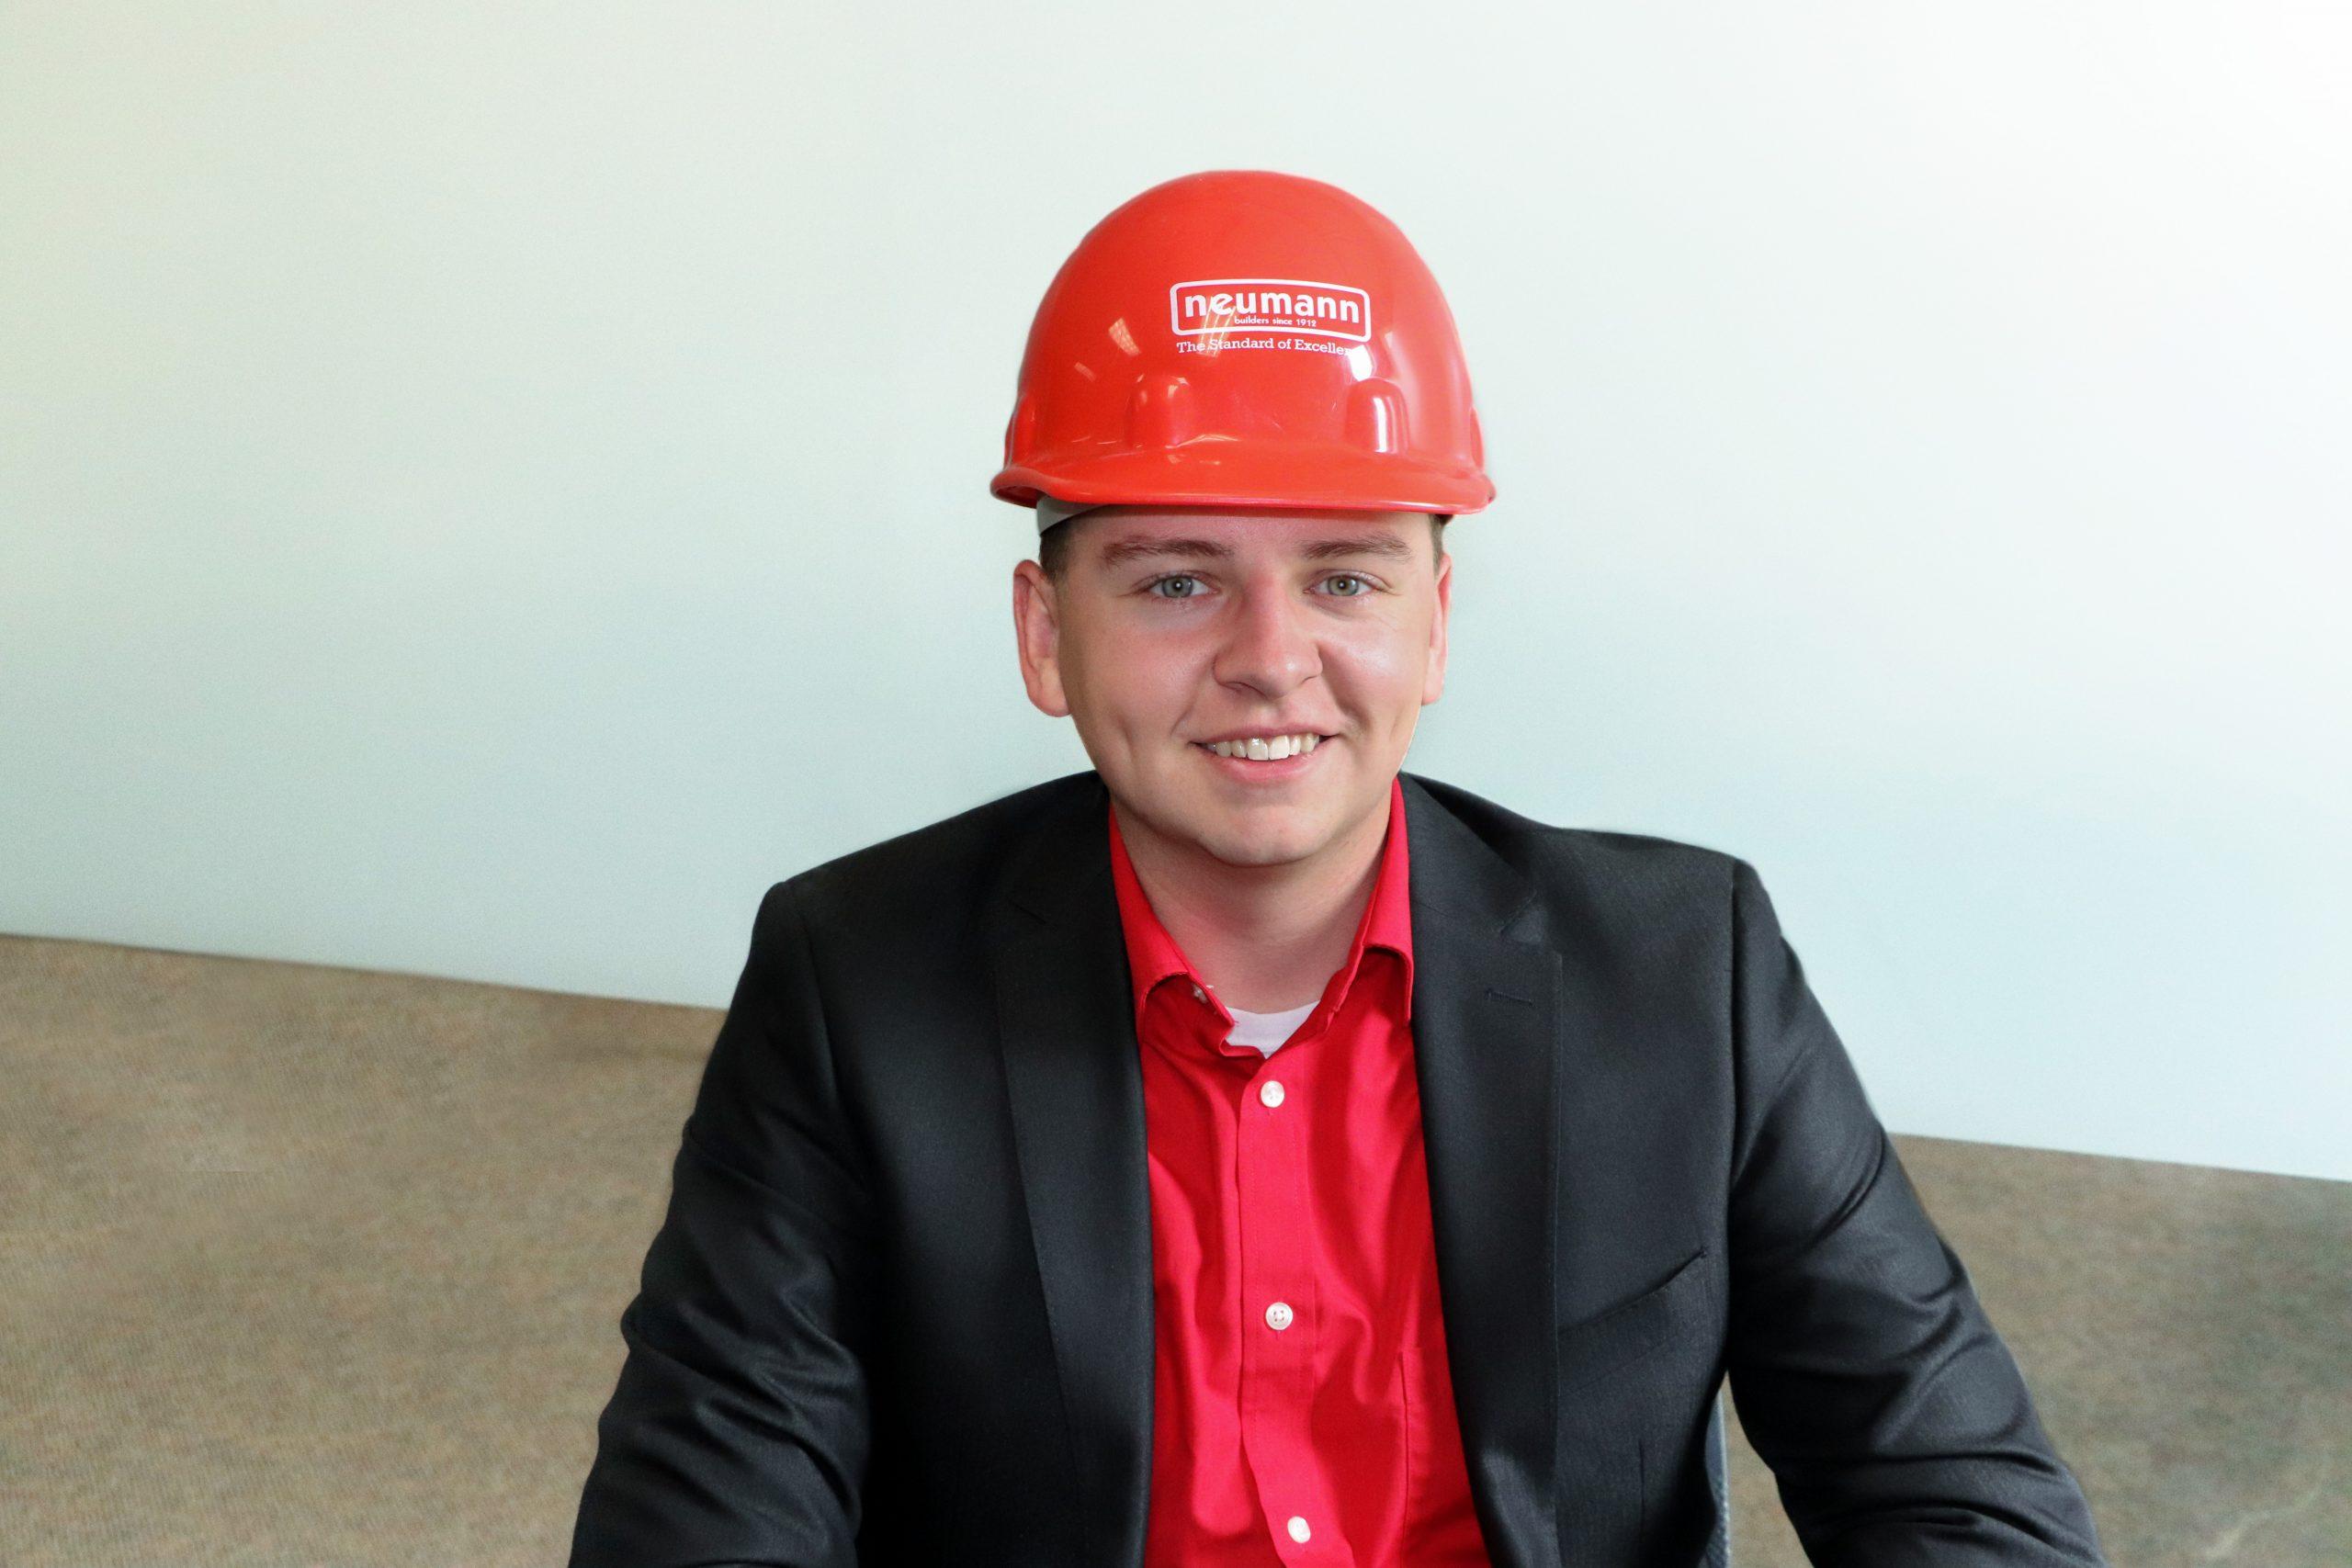 Project Engineer: James McNaughton